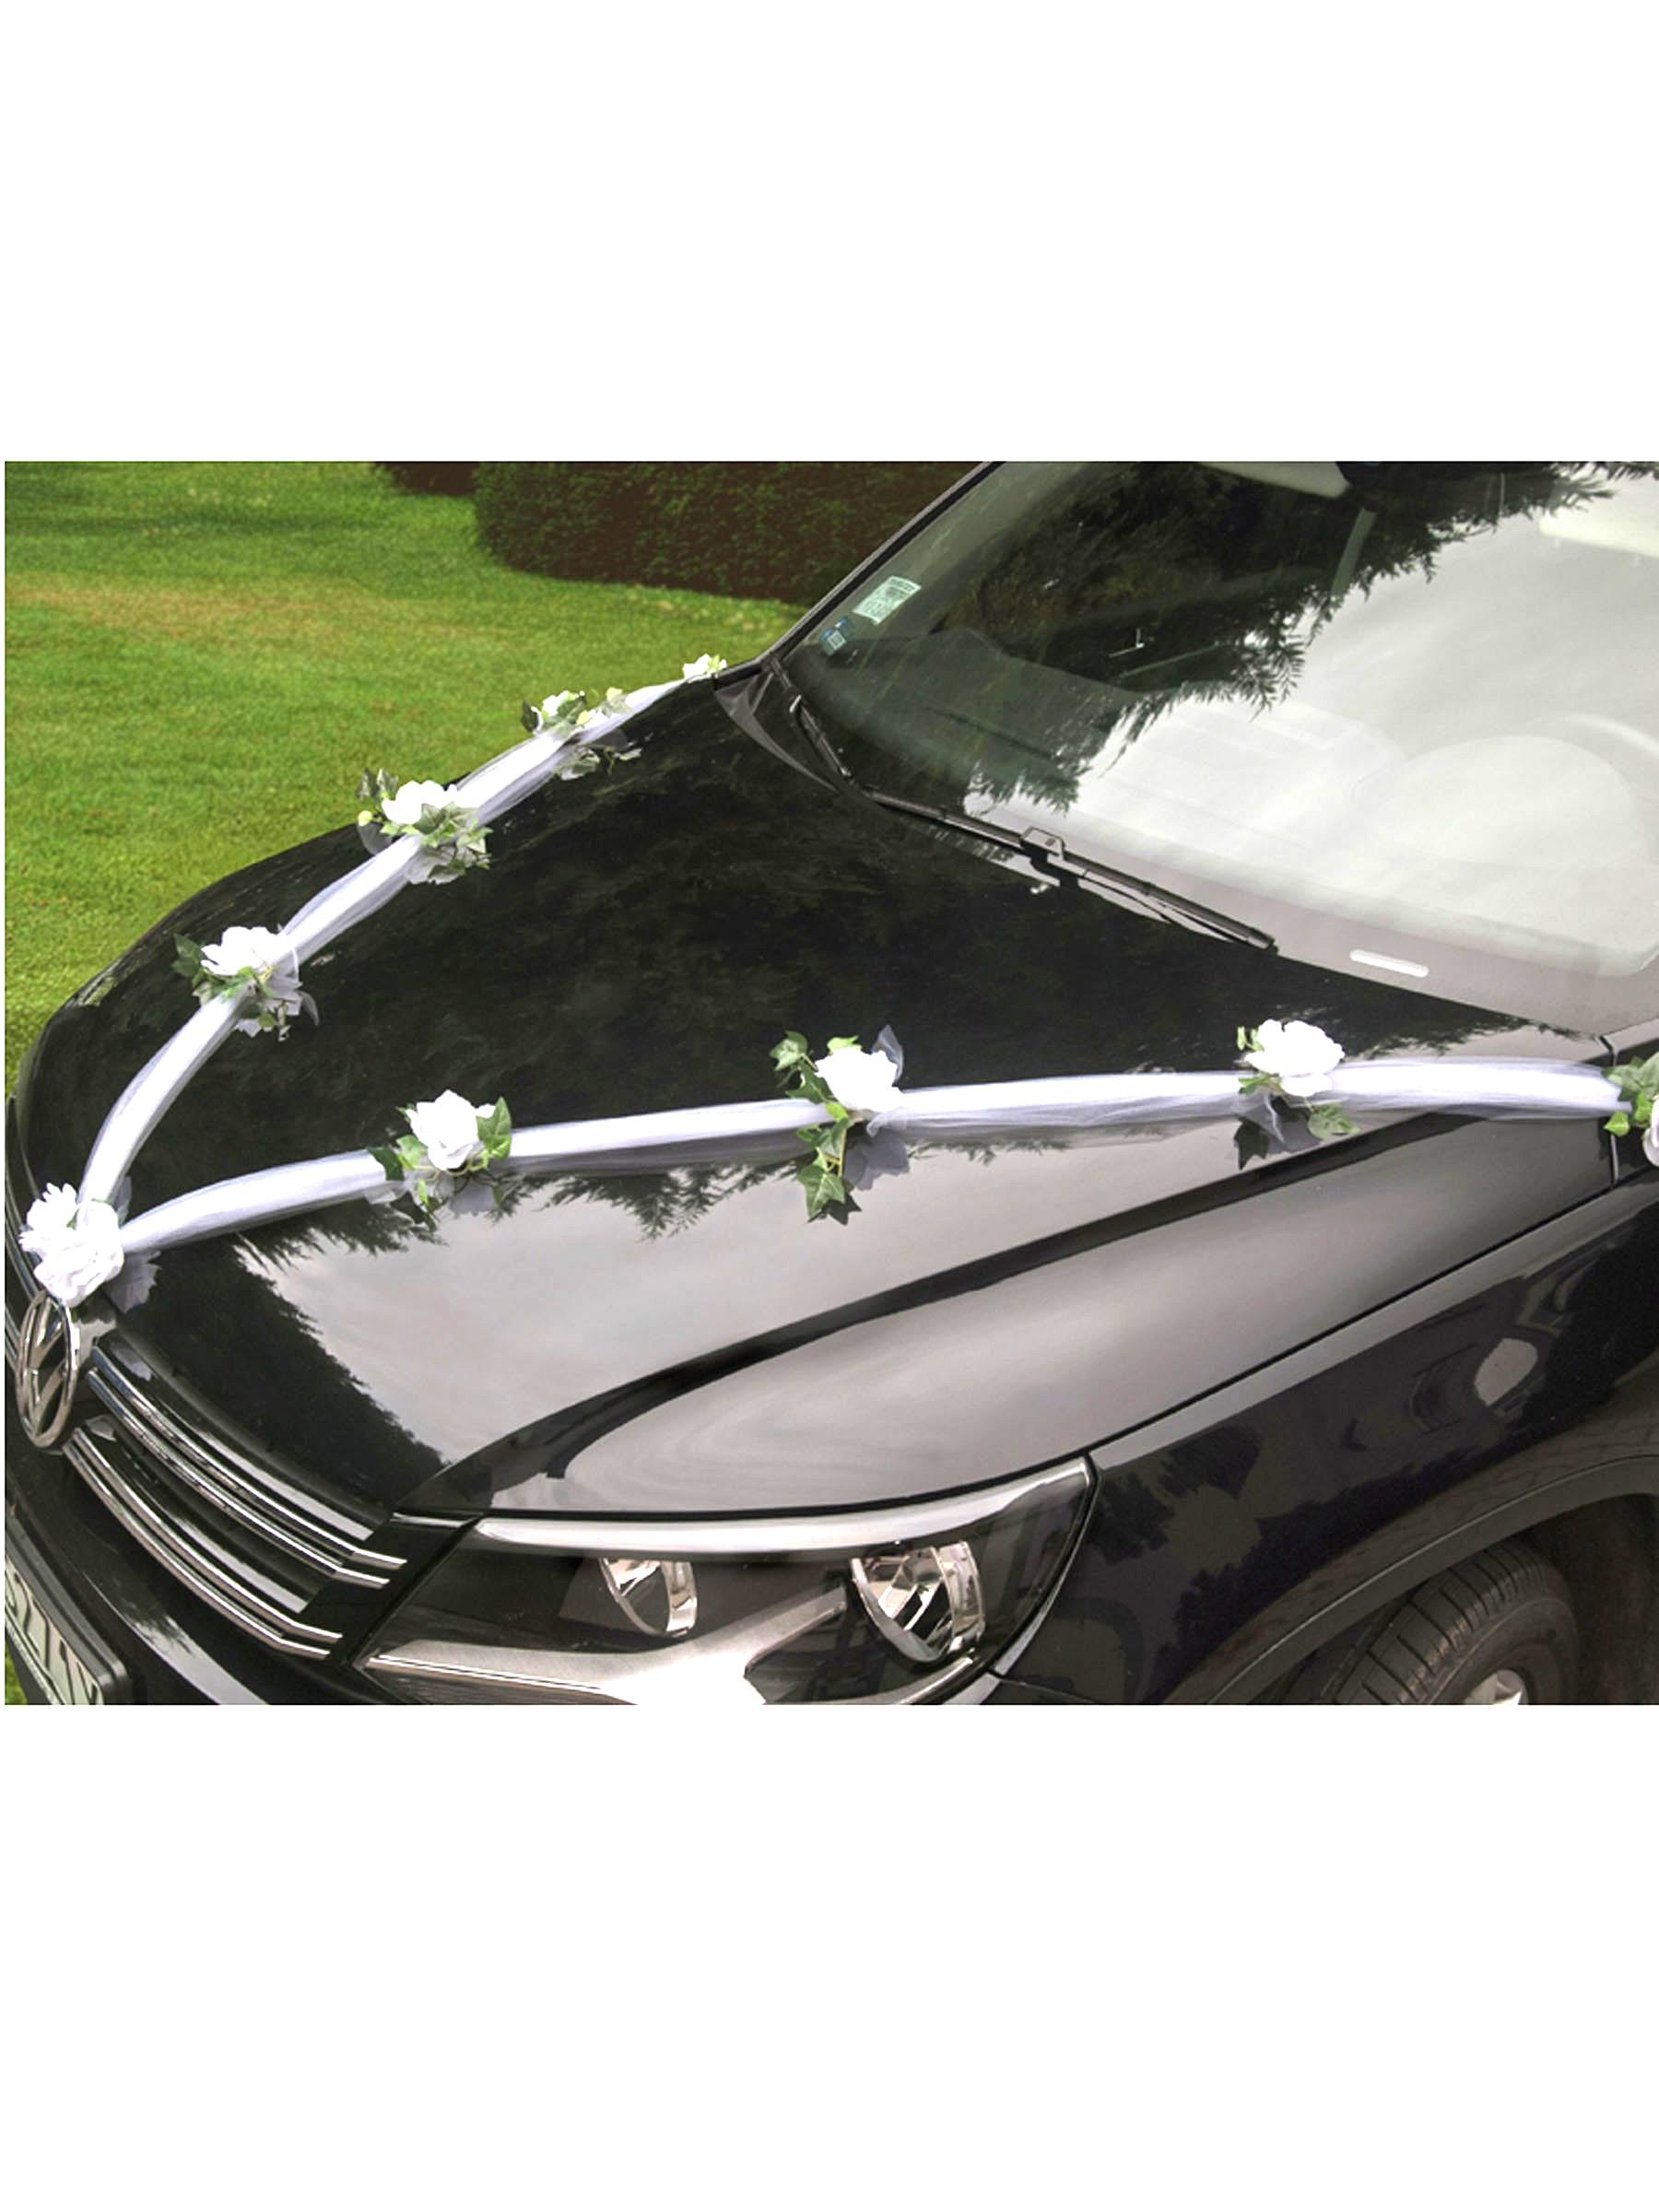 Decoration Voiture Tulle : Décoration voiture tulle roses anniversaire